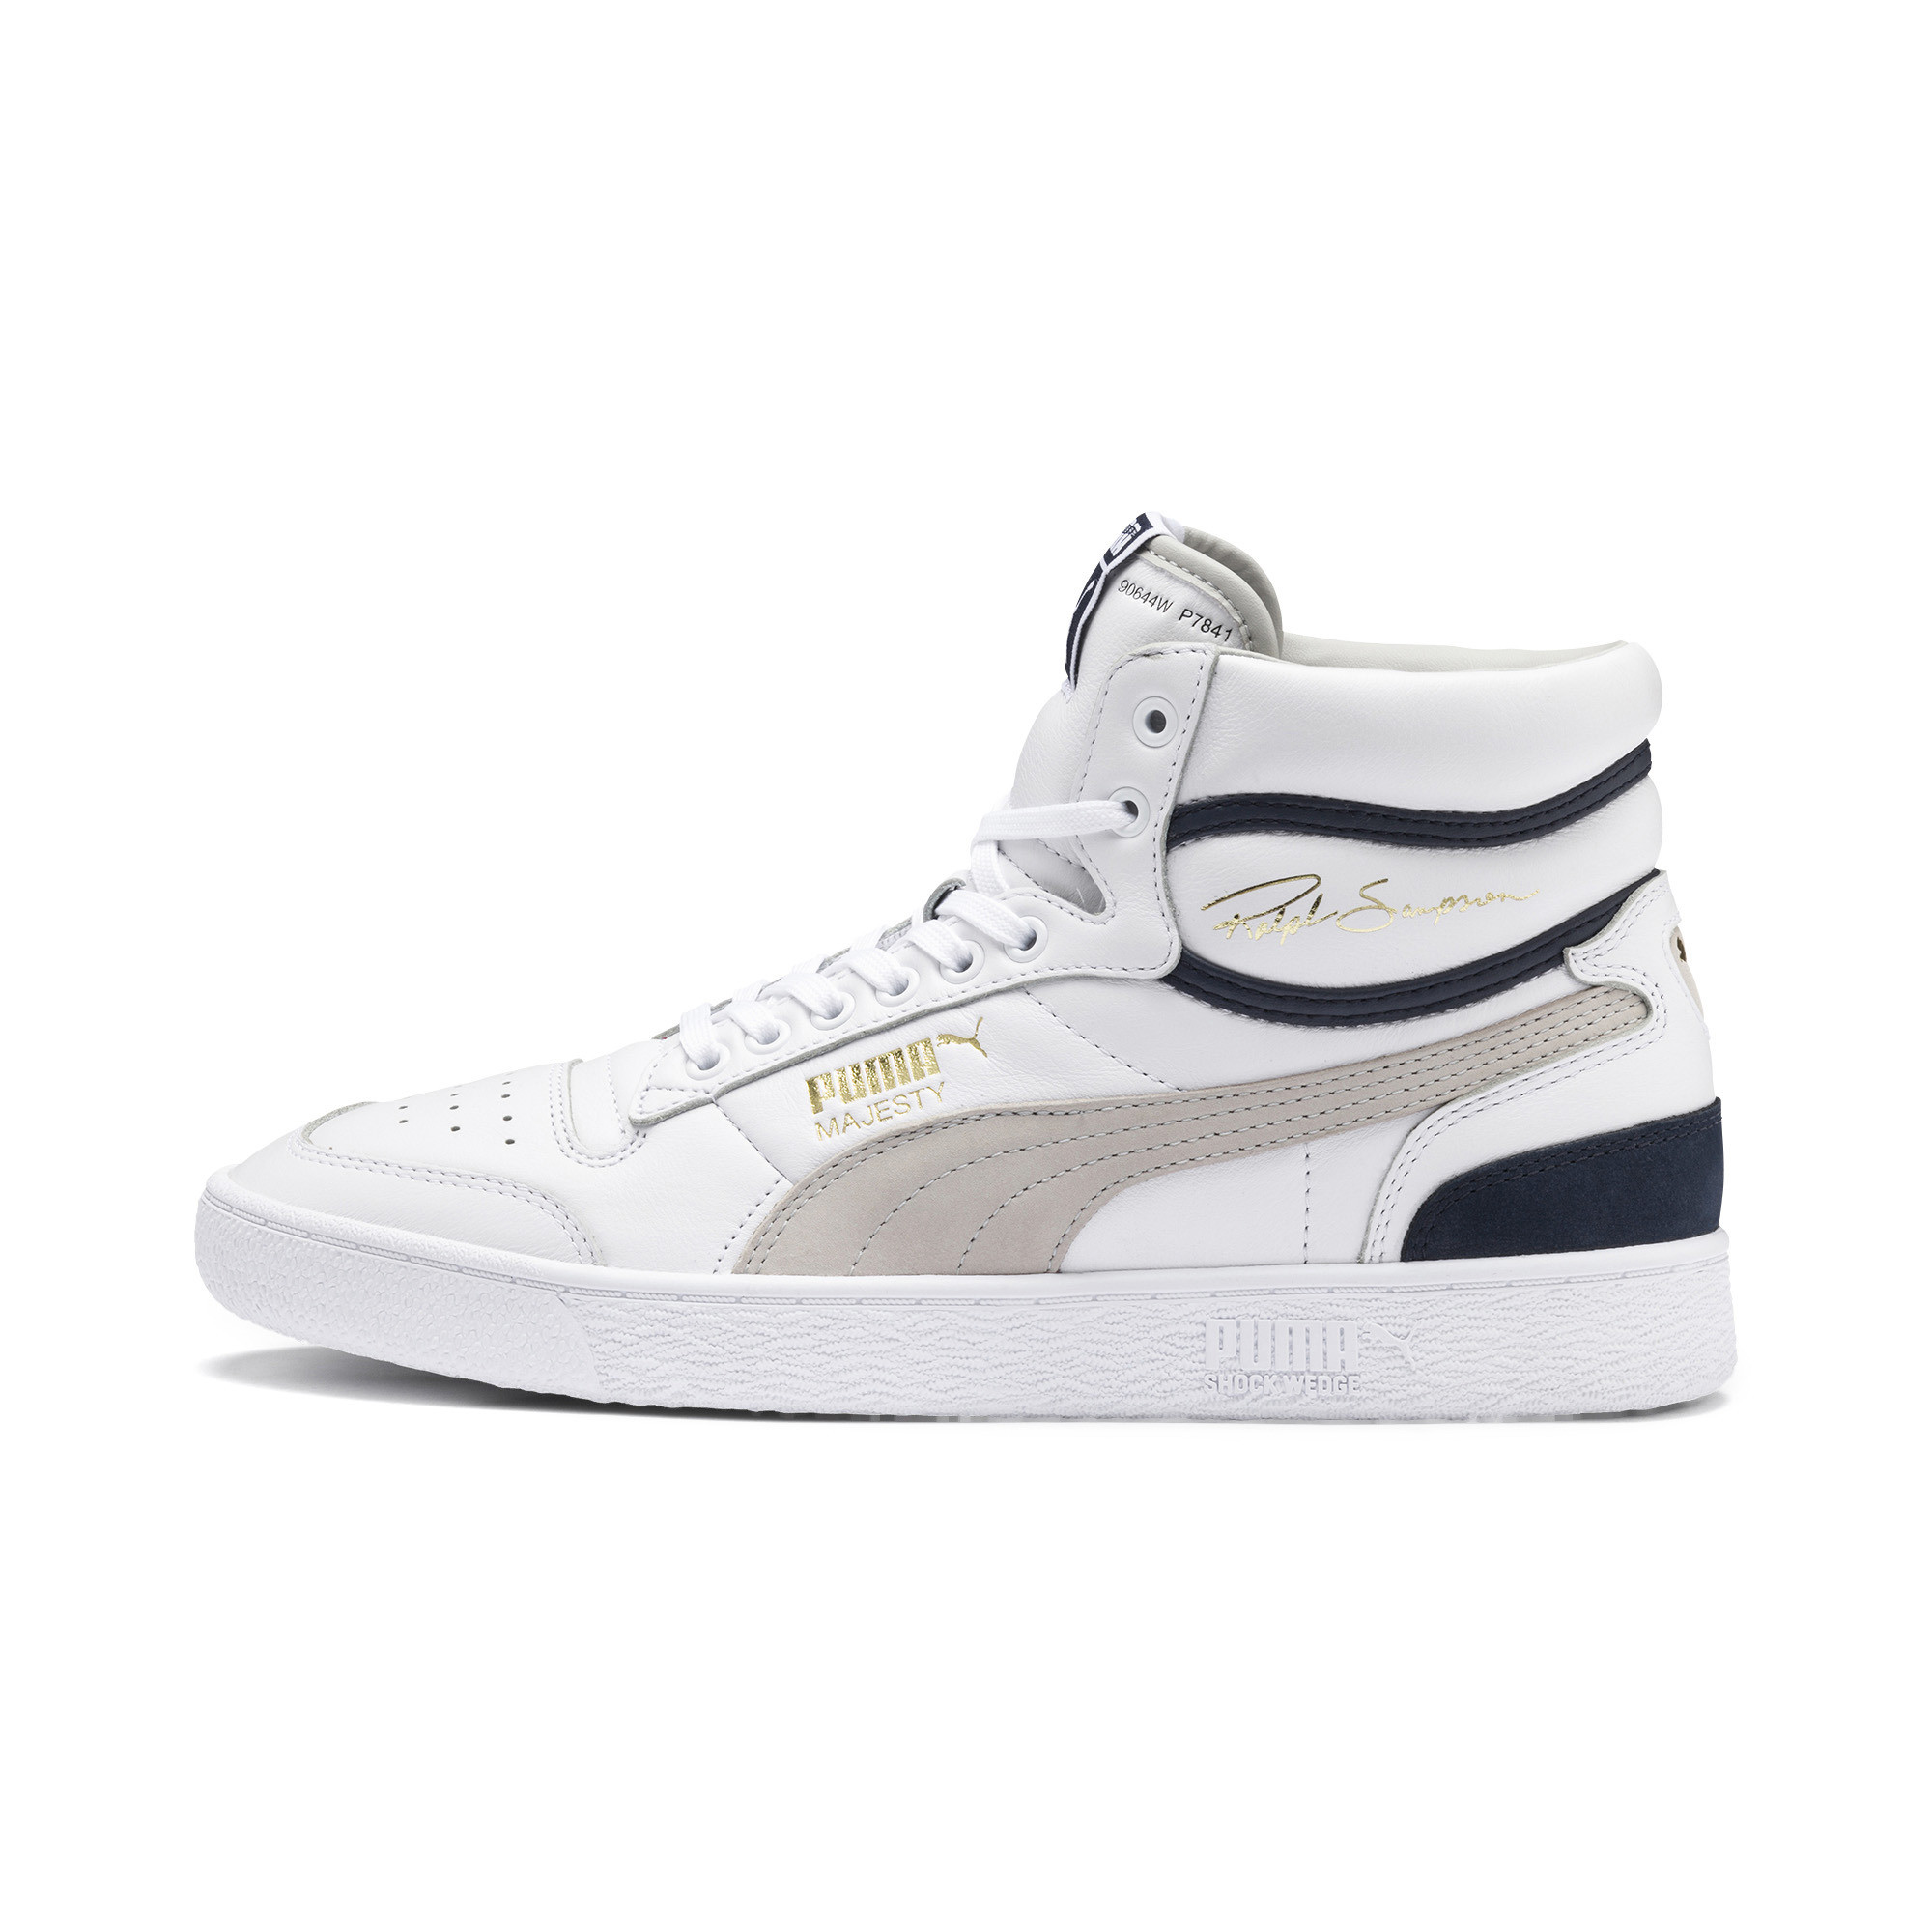 Image Puma Ralph Sampson Mid OG Sneakers #1